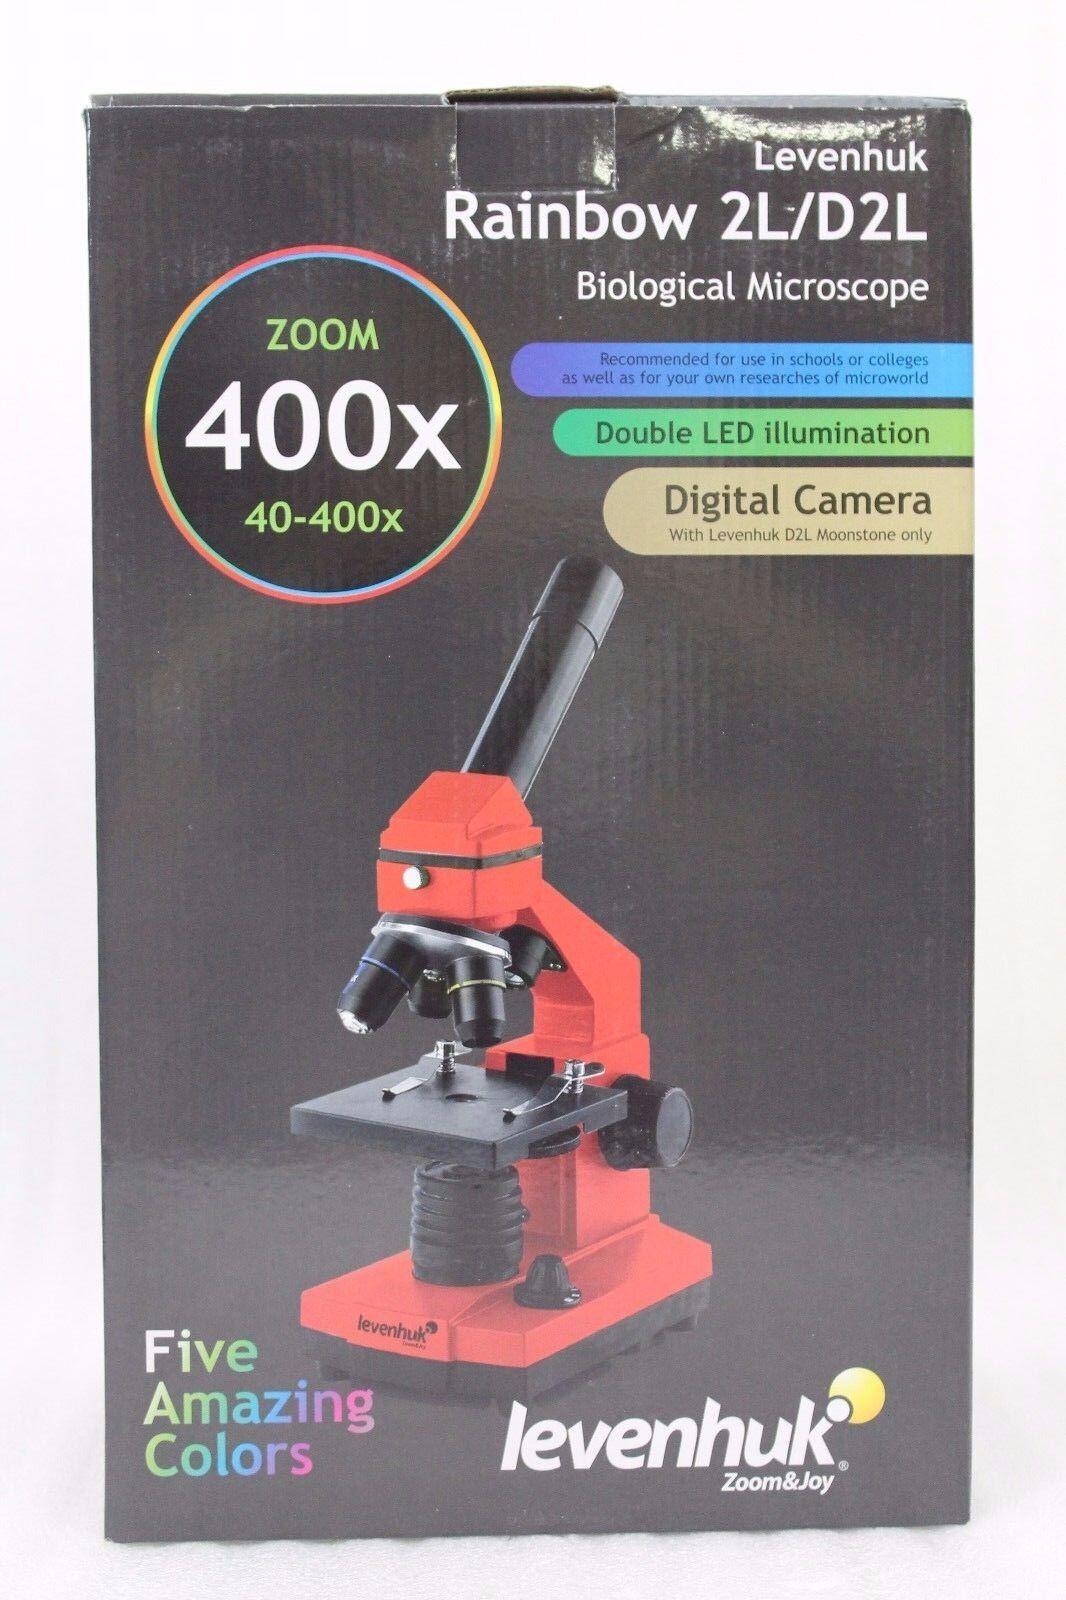 Levenhuk 2L Mikroskop Regenbogen Mondstein Grau inklusive Experiment Kit